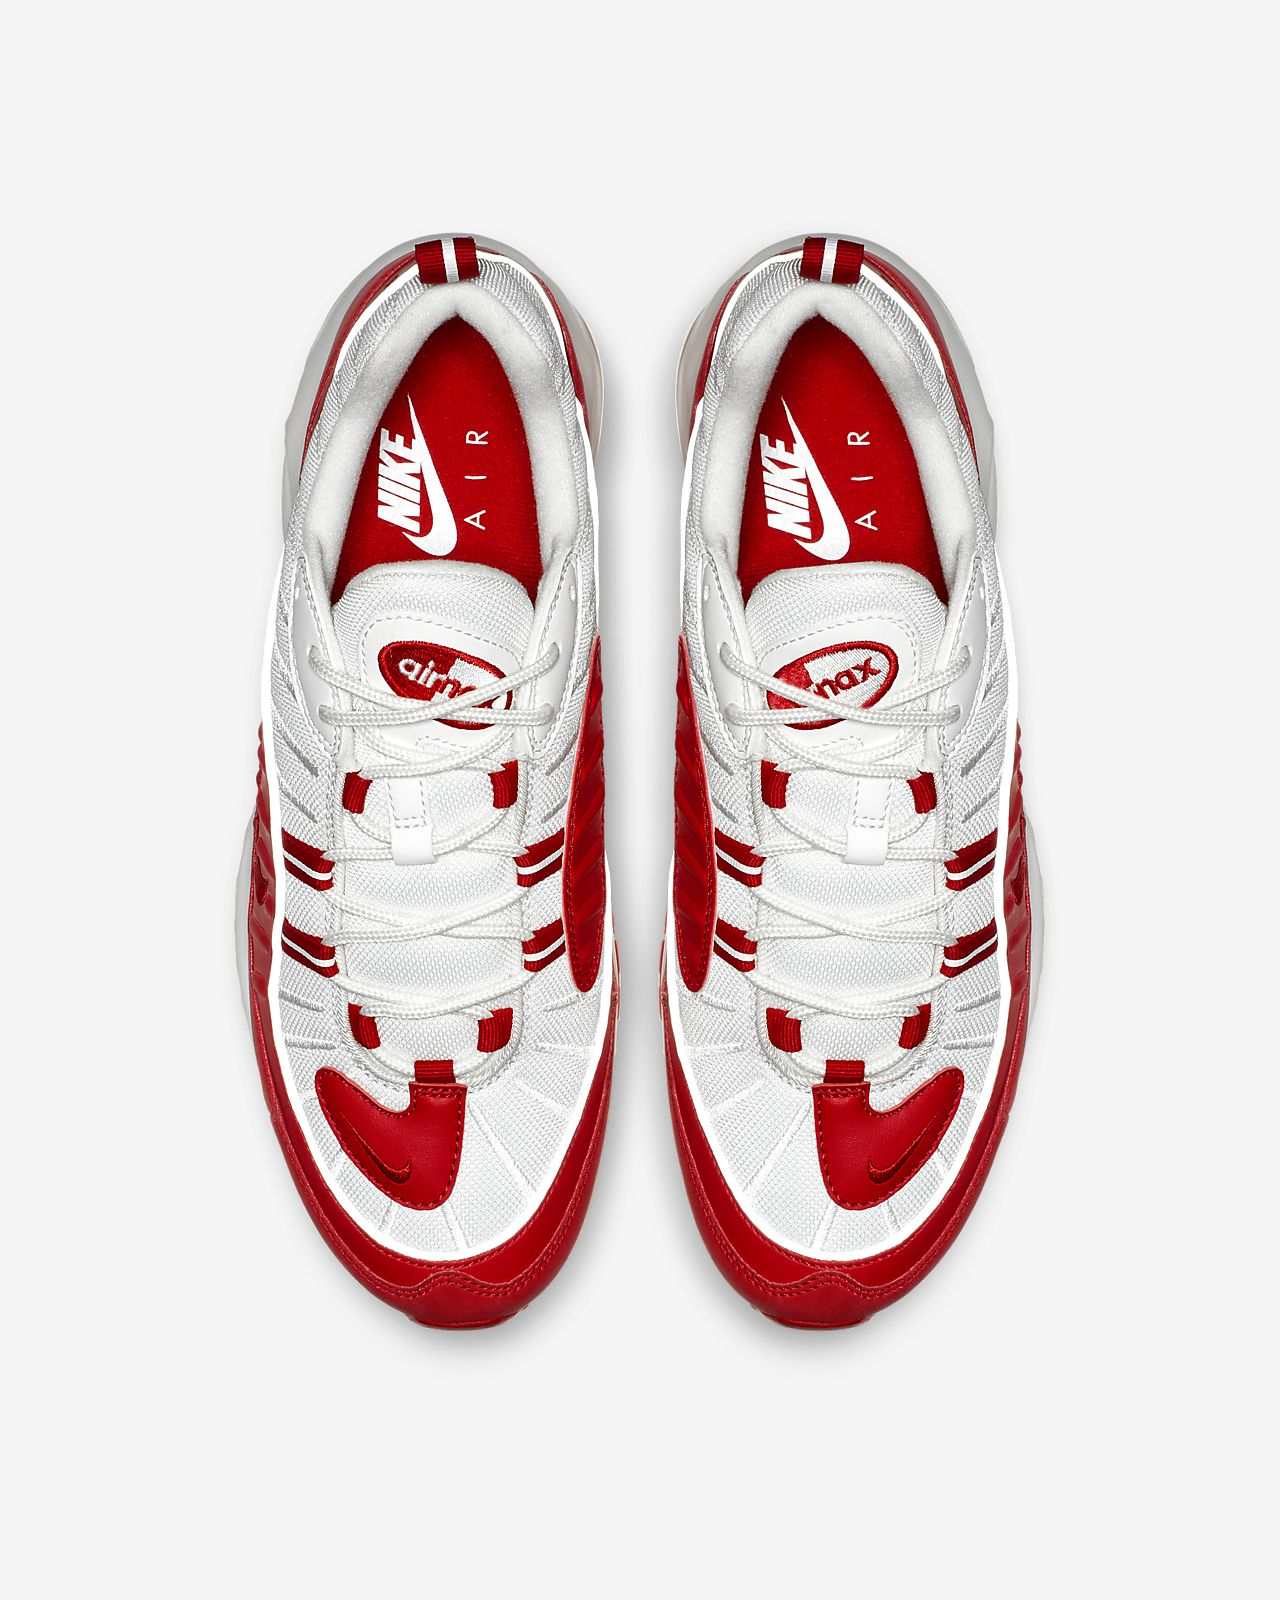 4e8f2b323a62 Nike Air Max 98 Men s Shoe. Nike.com NZ